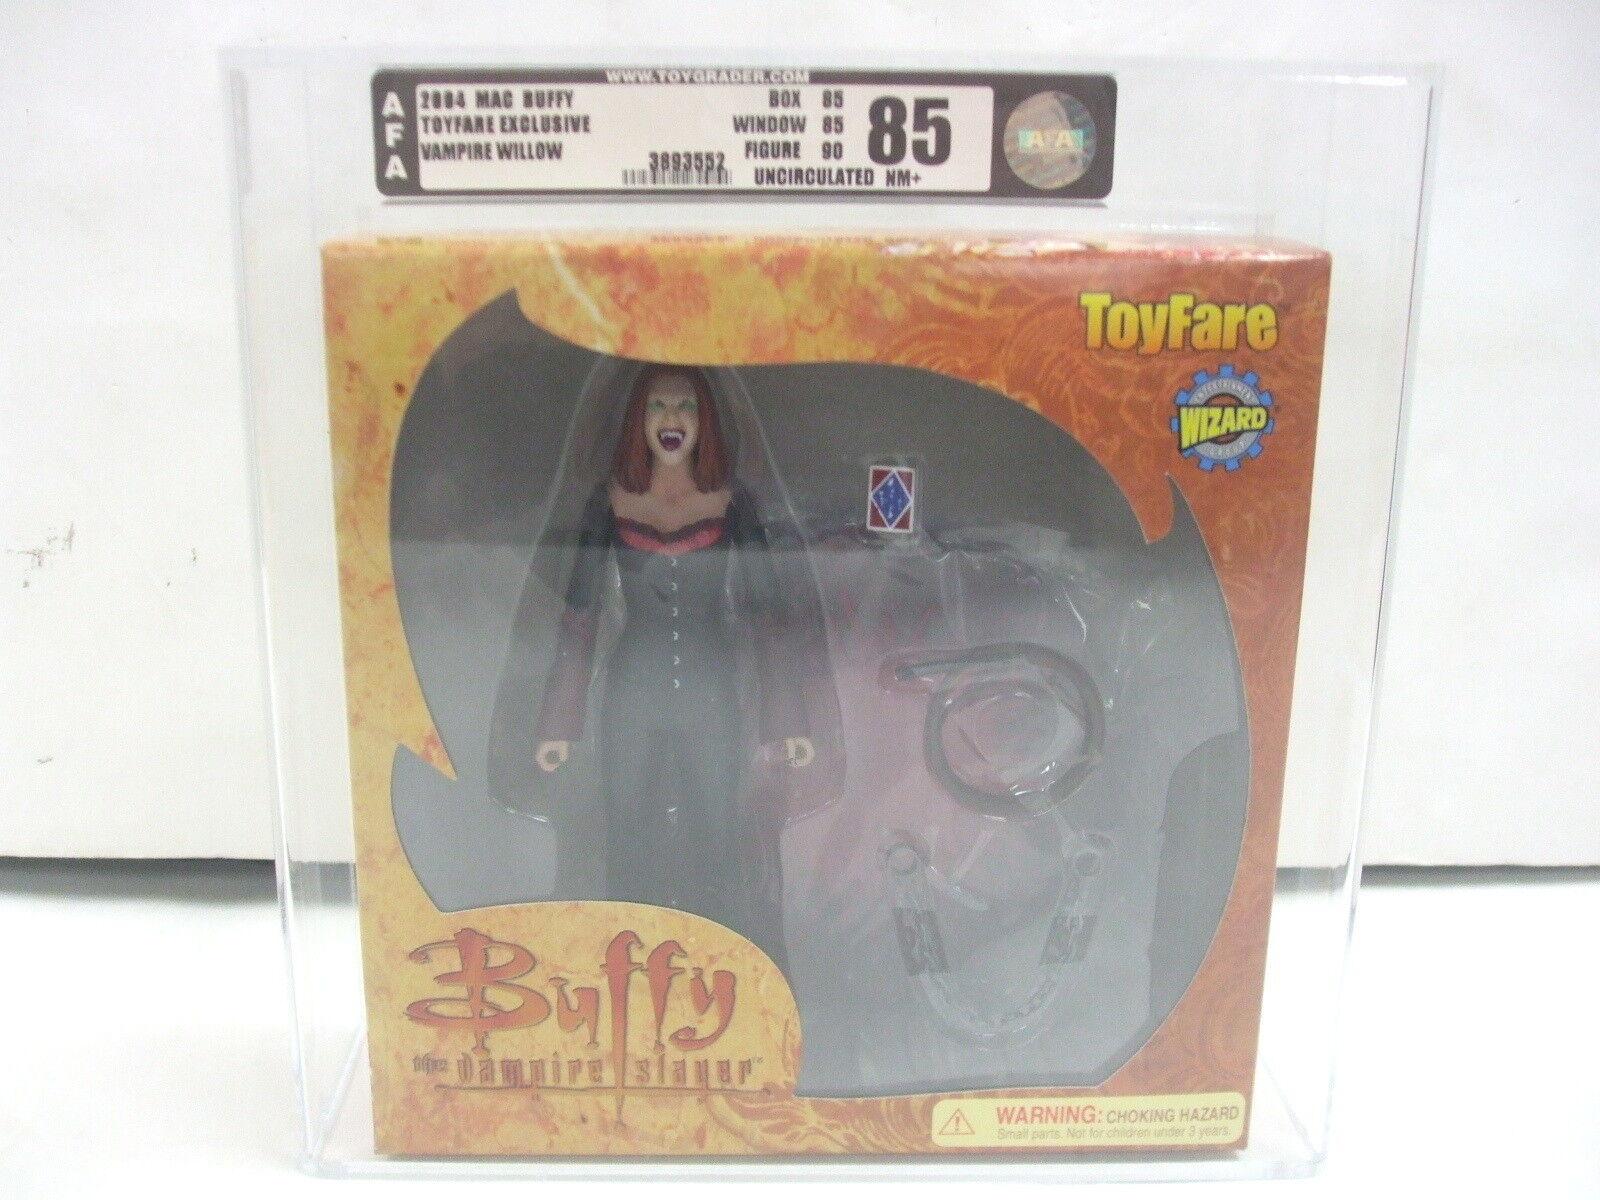 Toyfare Toyfare Toyfare Exclusive Buffy the Vampire Slayer VAMPIRE WILLOW - MISB - AFA 85 e622bd